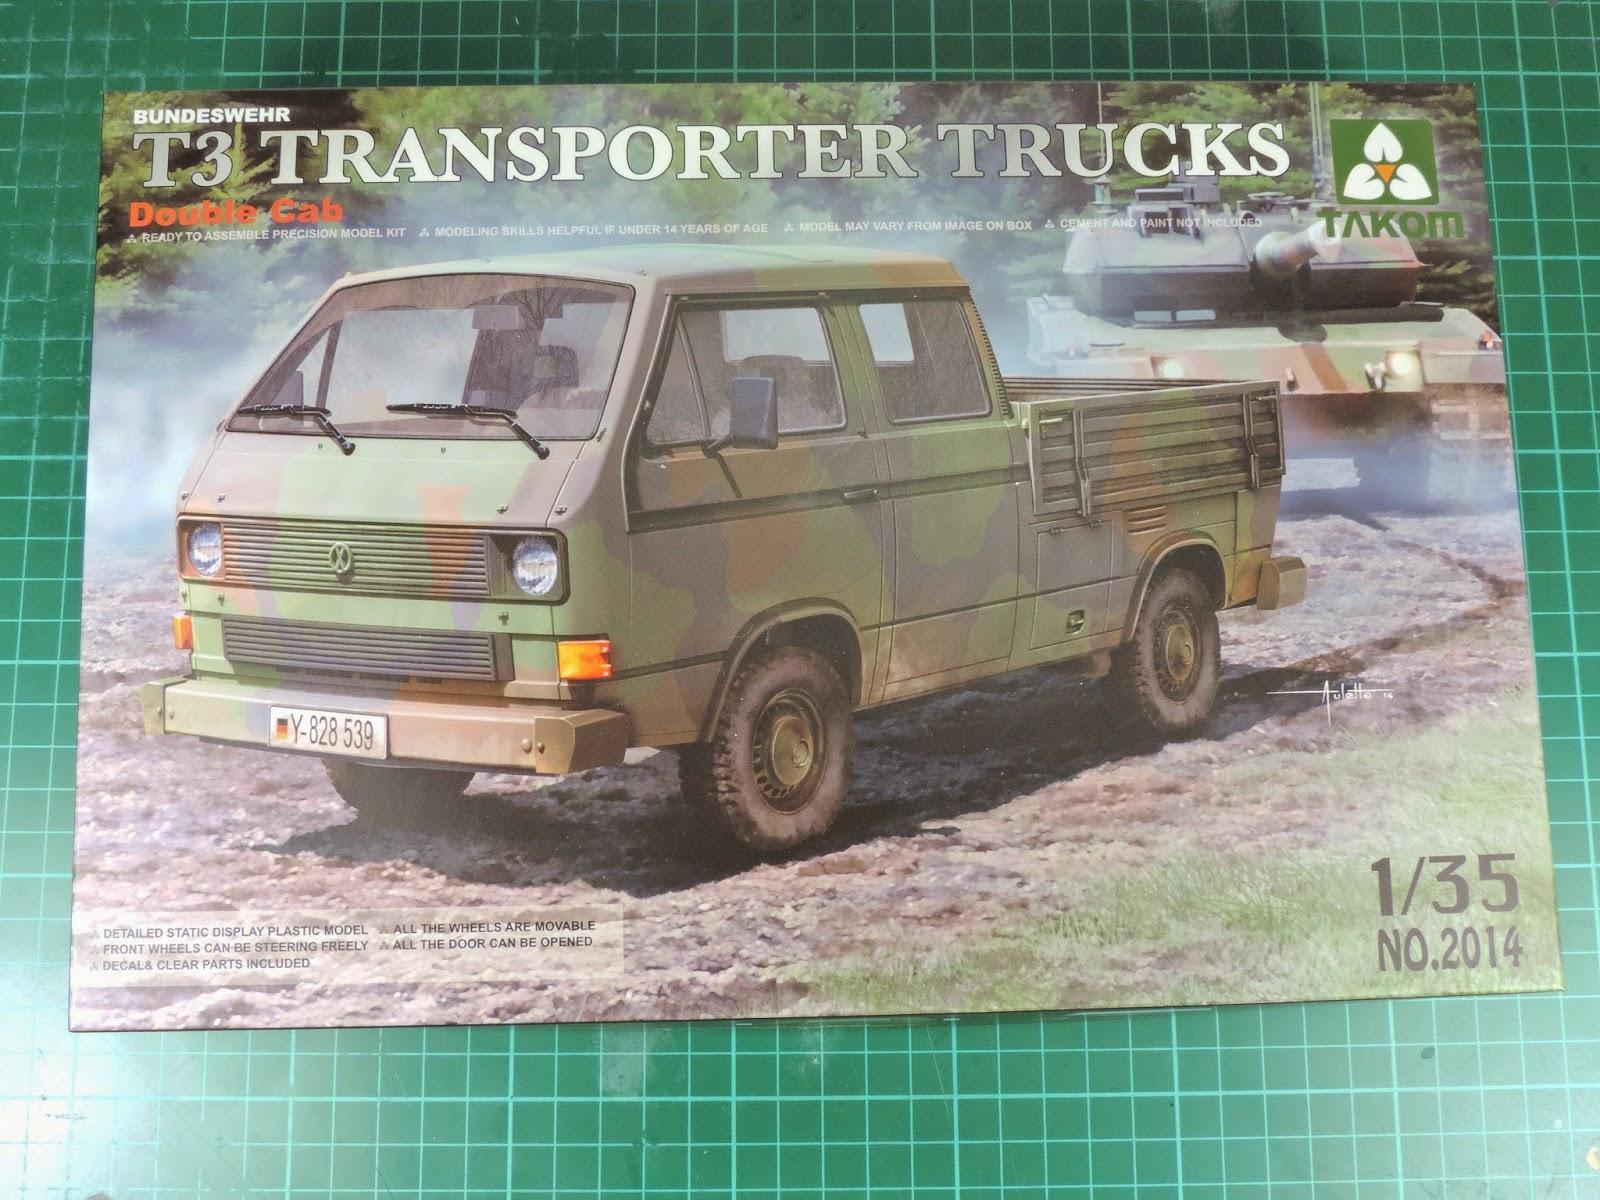 Pete's Model World : Takom 1/35th T3 Transporter Trucks In